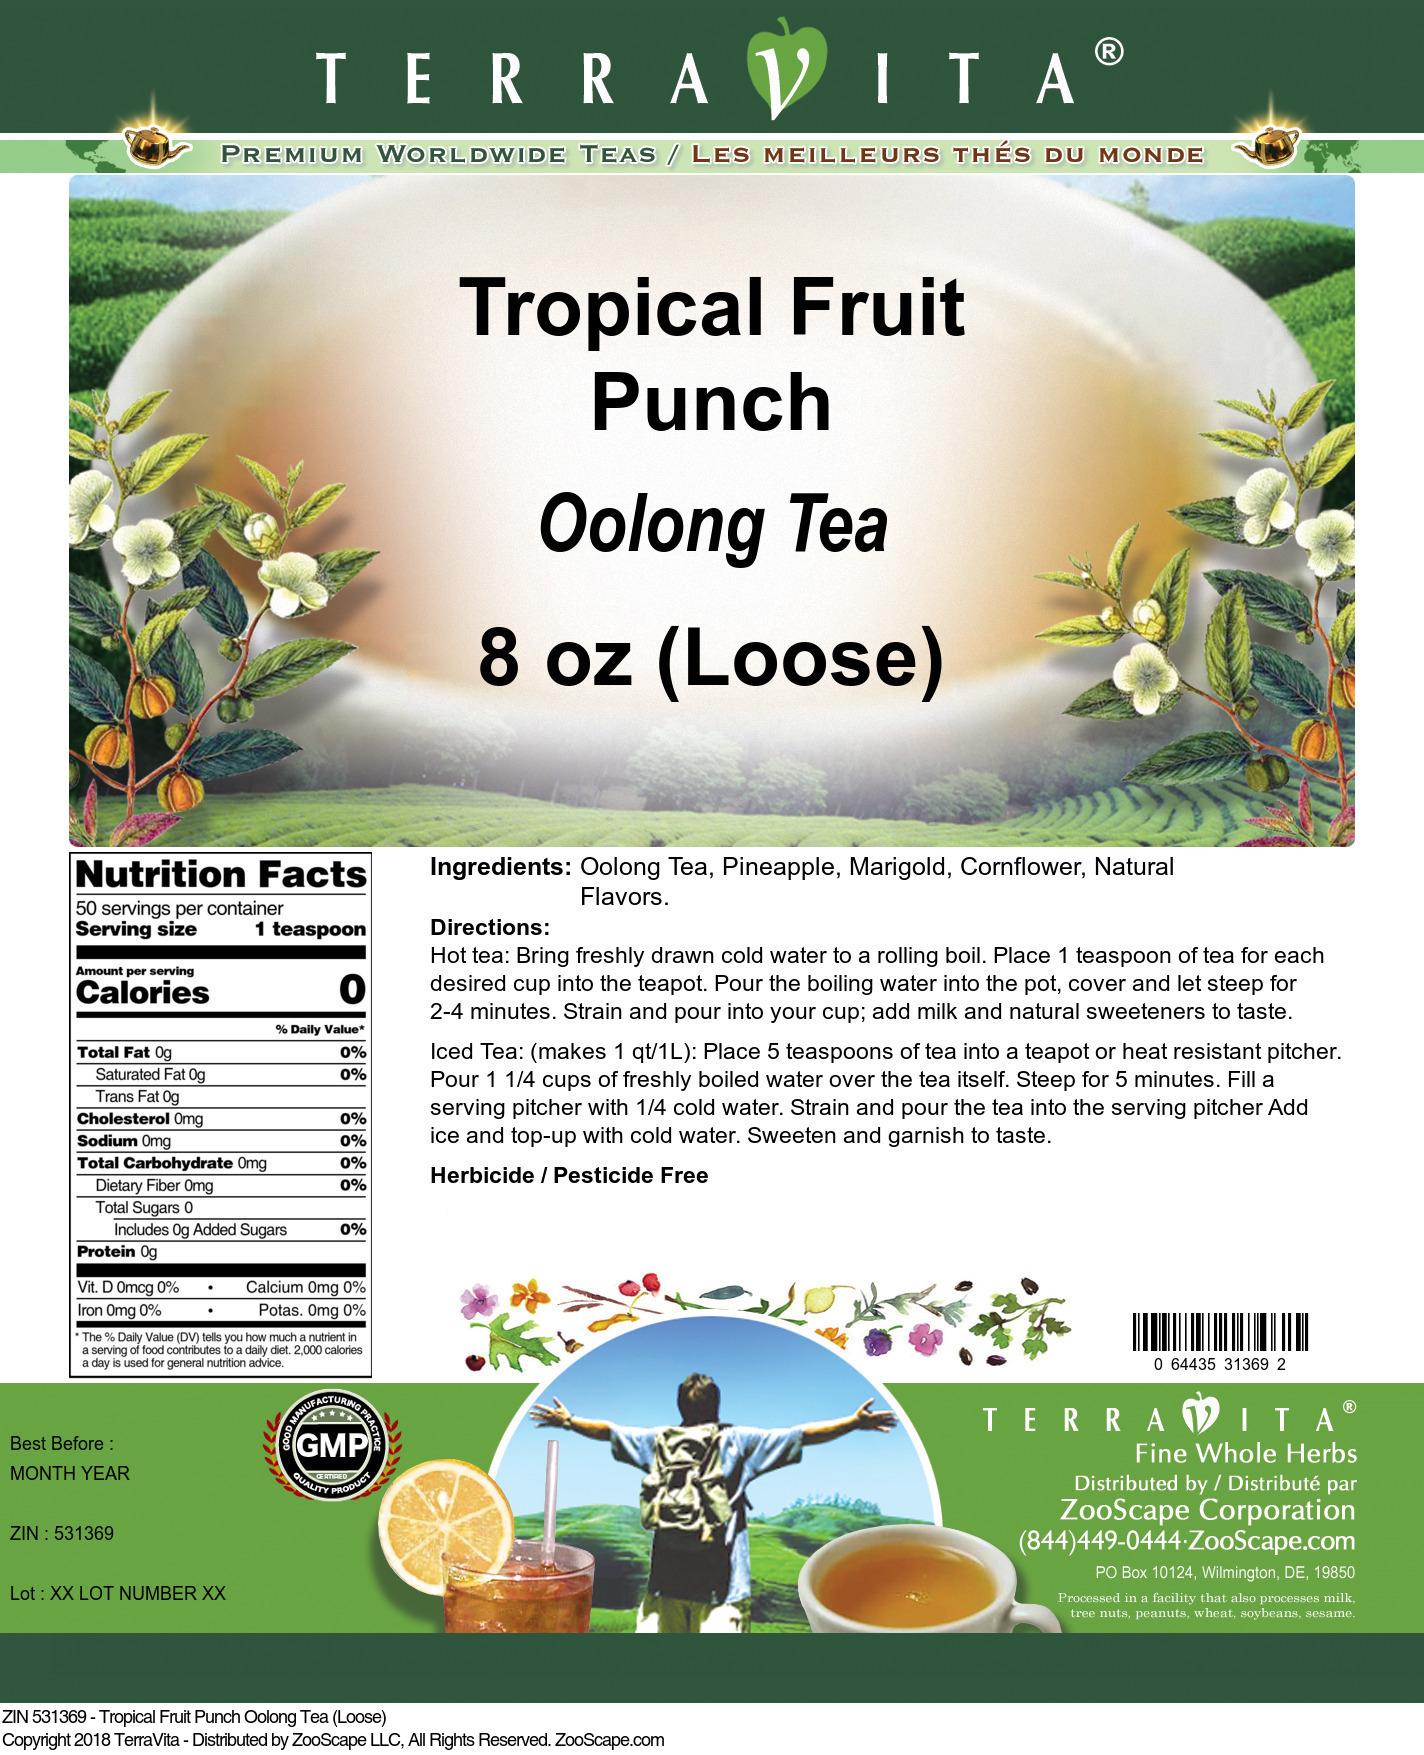 Tropical Fruit Punch Oolong Tea (Loose)